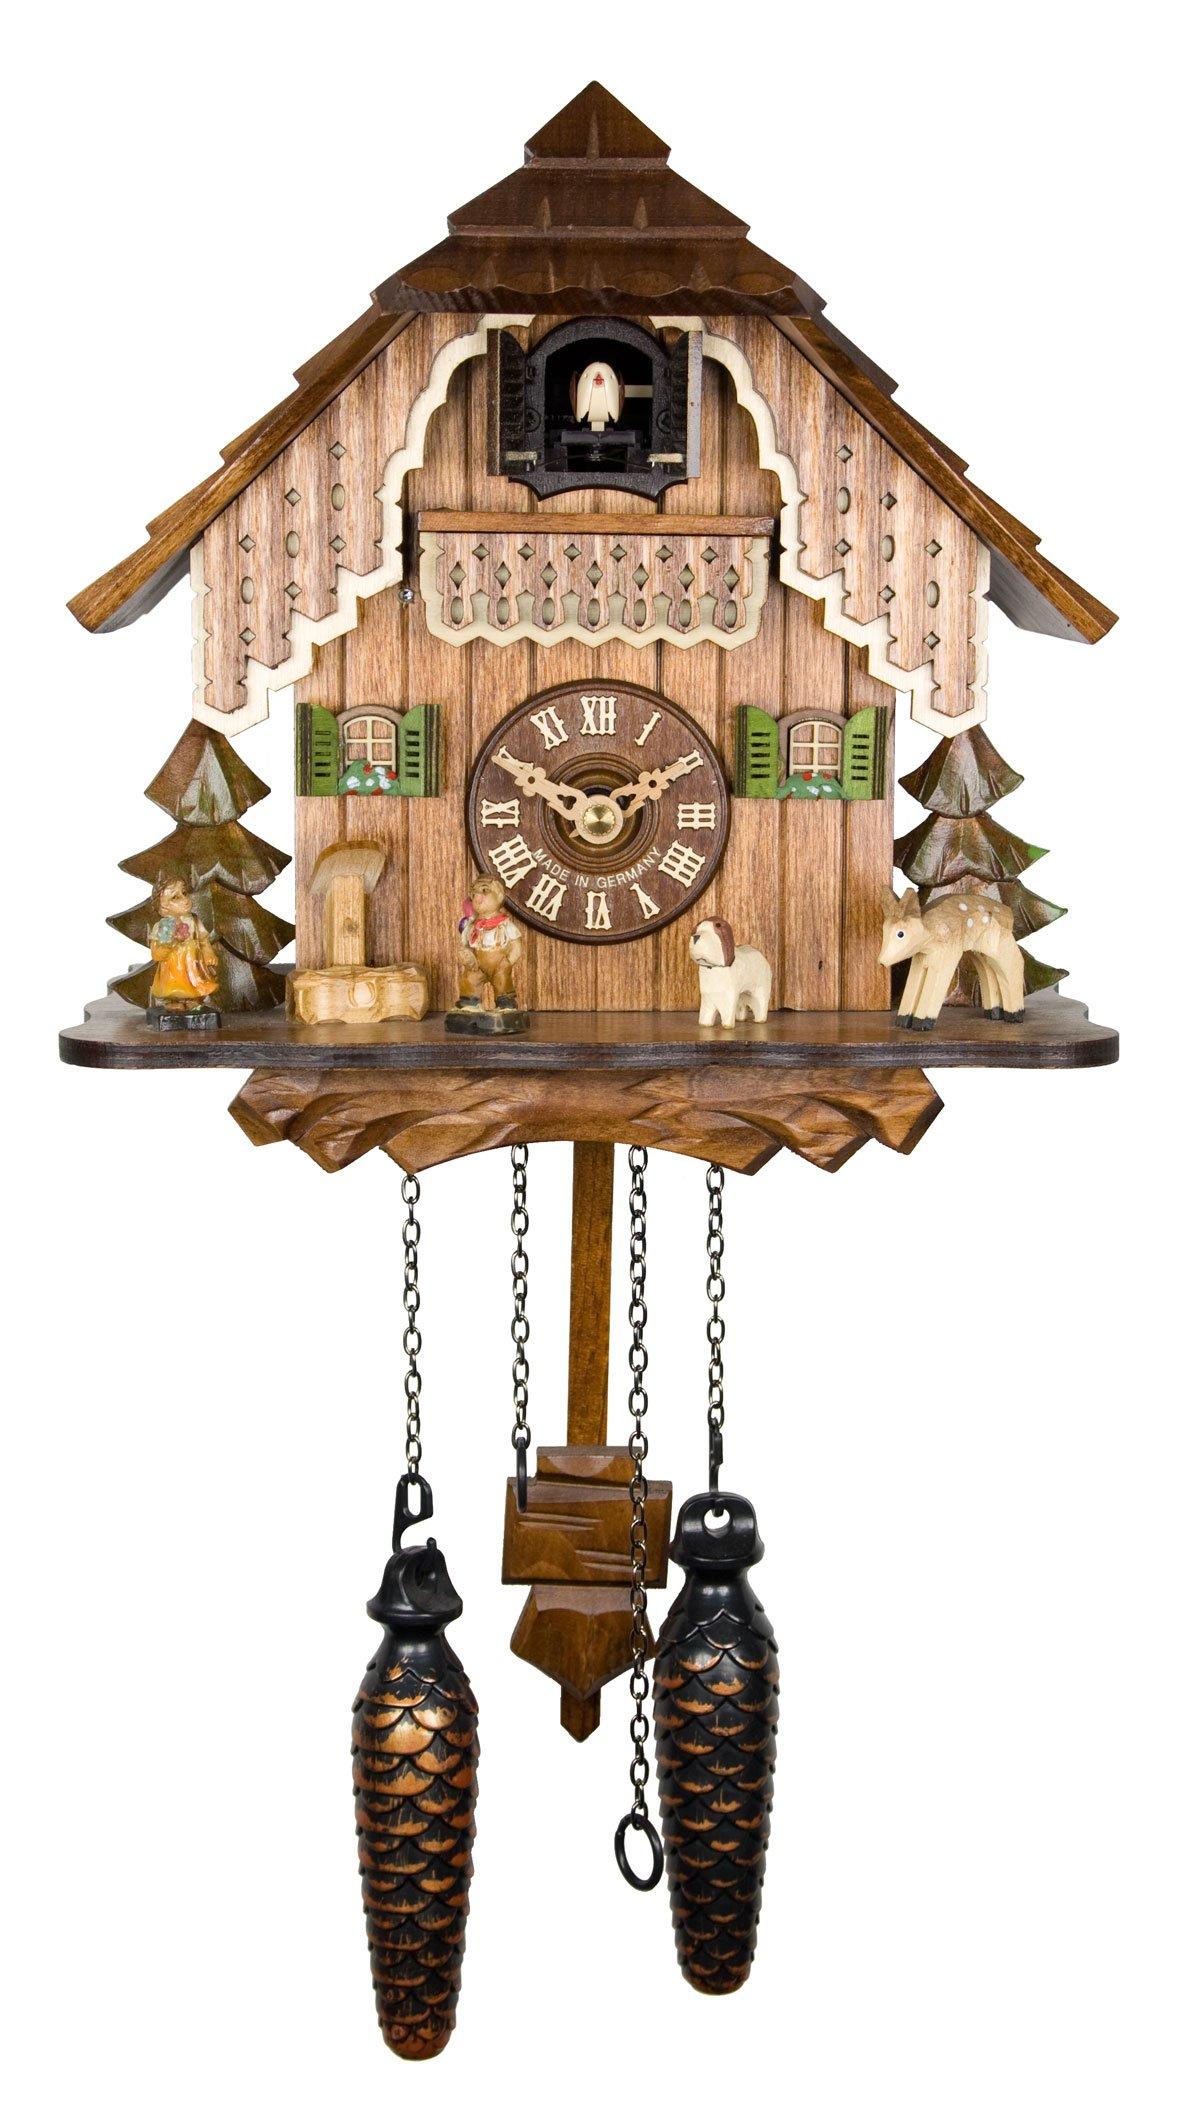 Adolf Herr Quartz Cuckoo Clock - The House in the Black Forest AH 19 QM